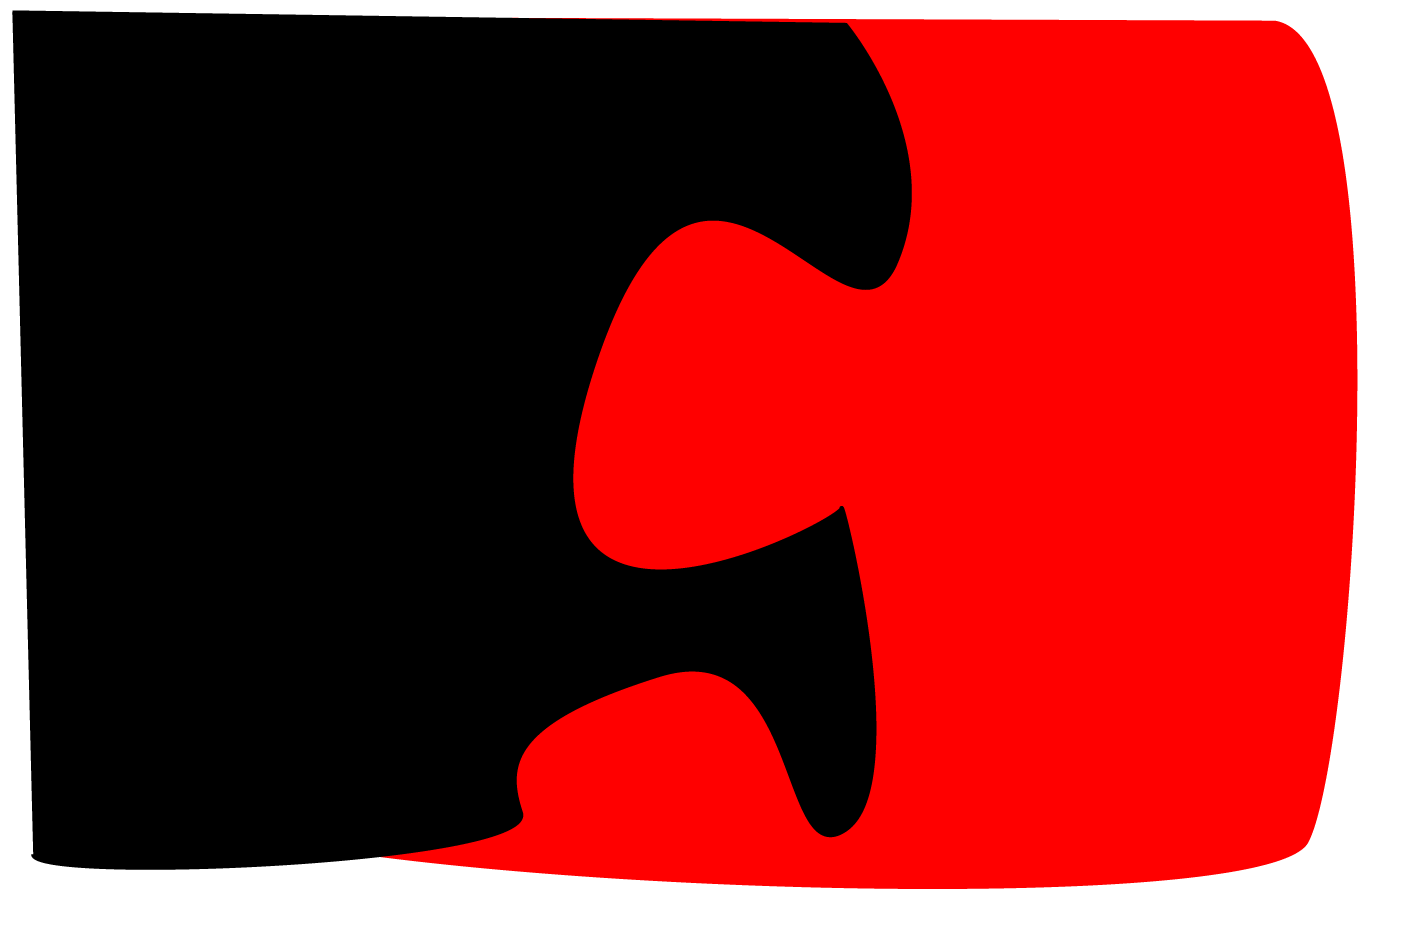 Logo Design by Safal Adam - Entry No. 292 in the Logo Design Contest Creative Logo Design for Strategyah.